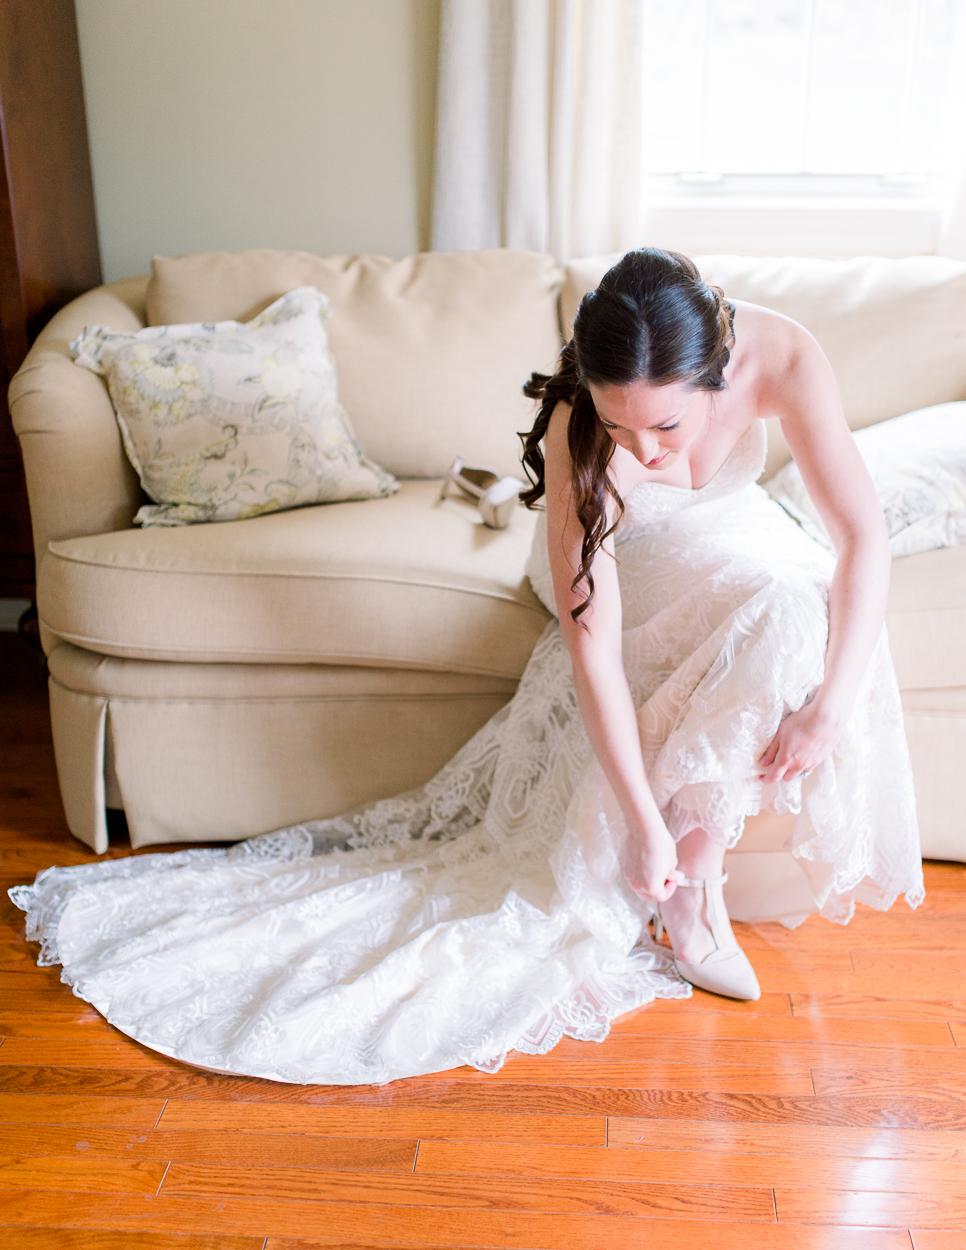 BigCork_vineyard wedding_virginiaweddingphotographer_youseephotography_SarahJames (34).JPG